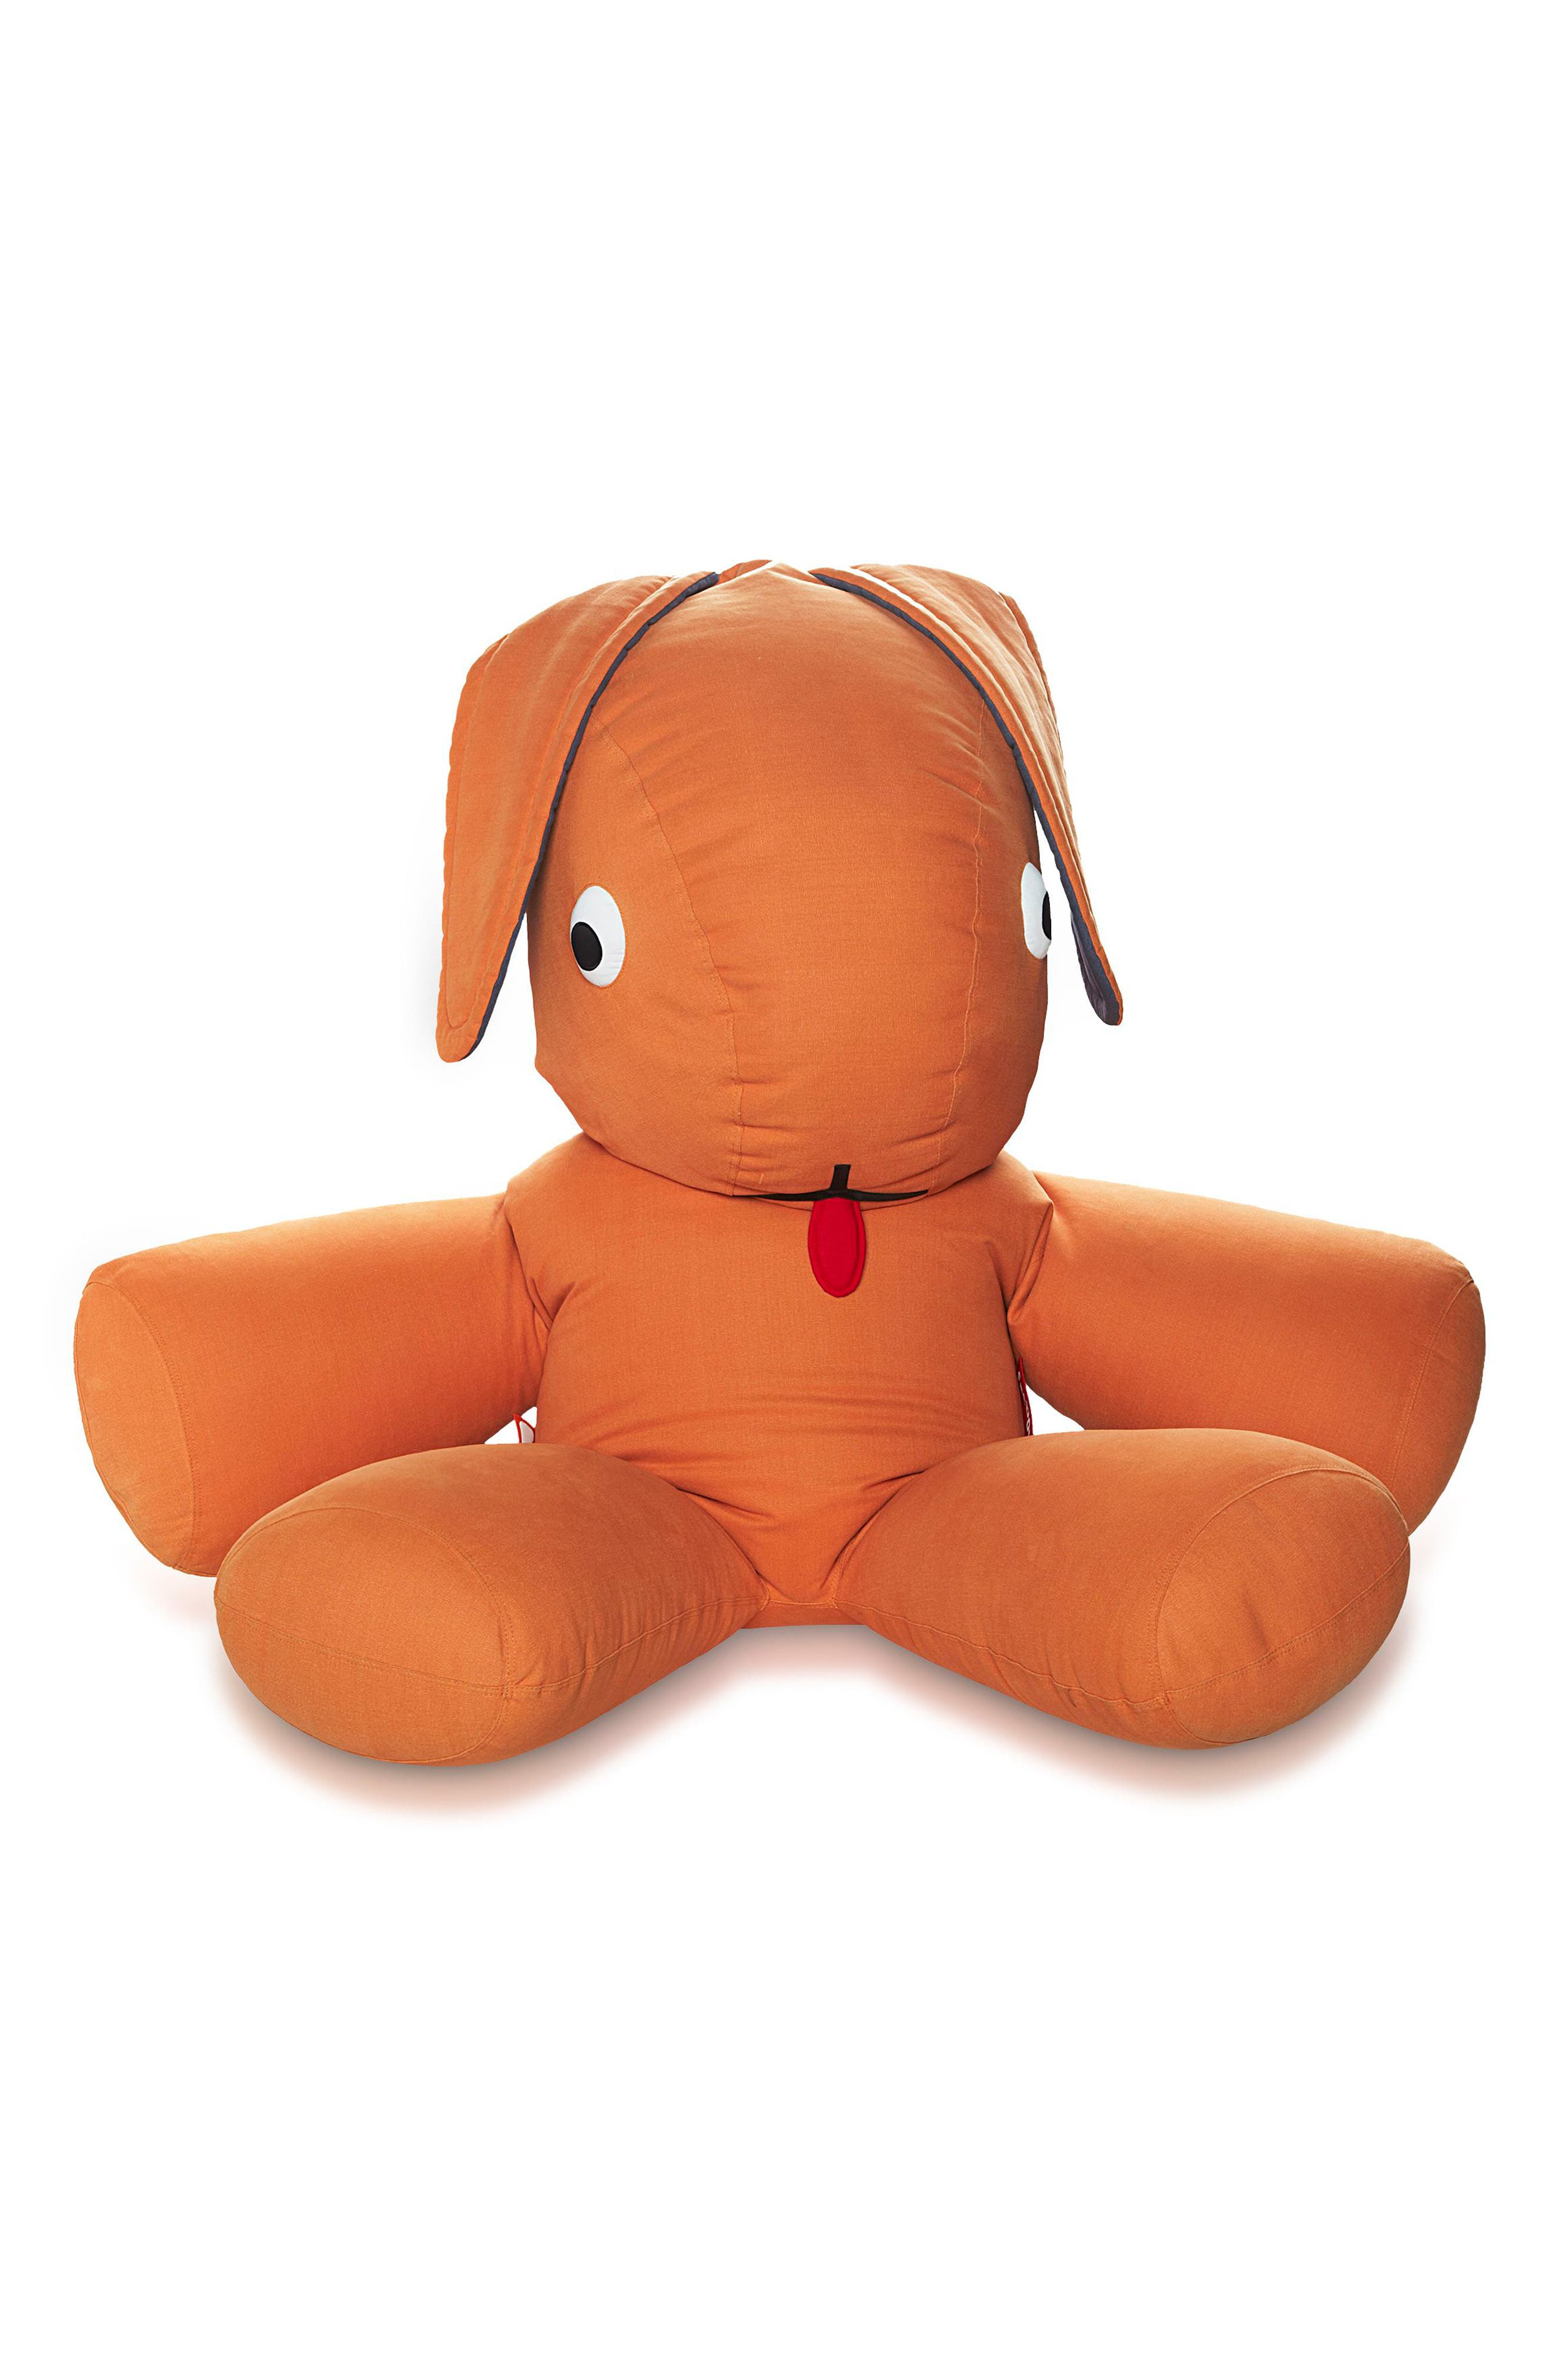 CO9 Oversize Bunny Lounger,                         Main,                         color, Orange